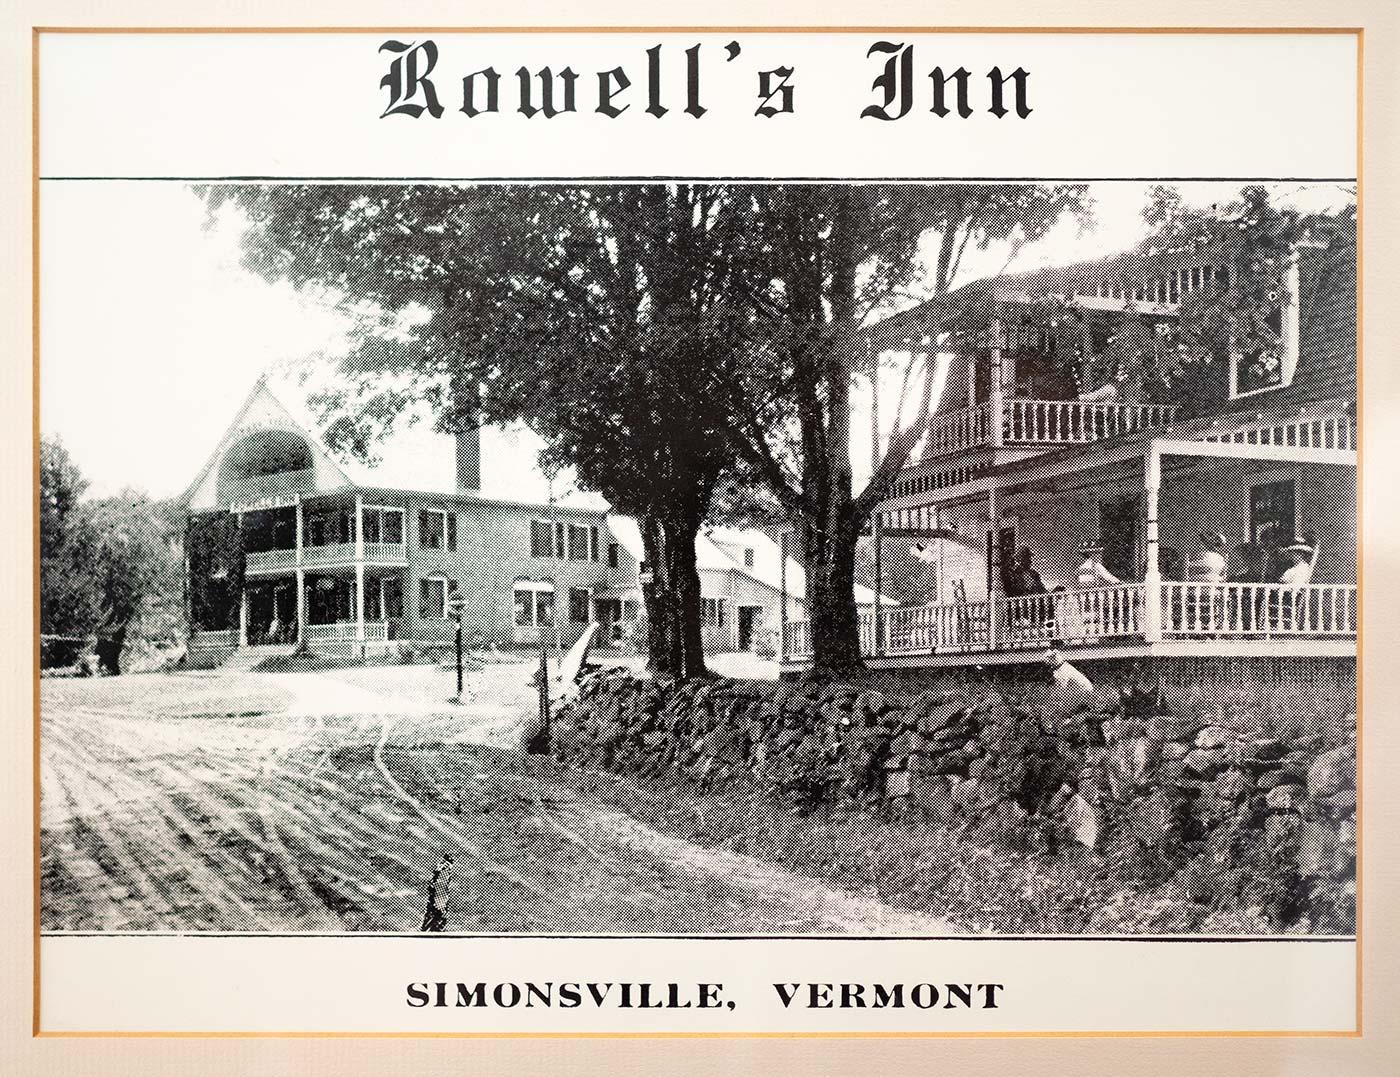 Rowell's Inn Historic Image